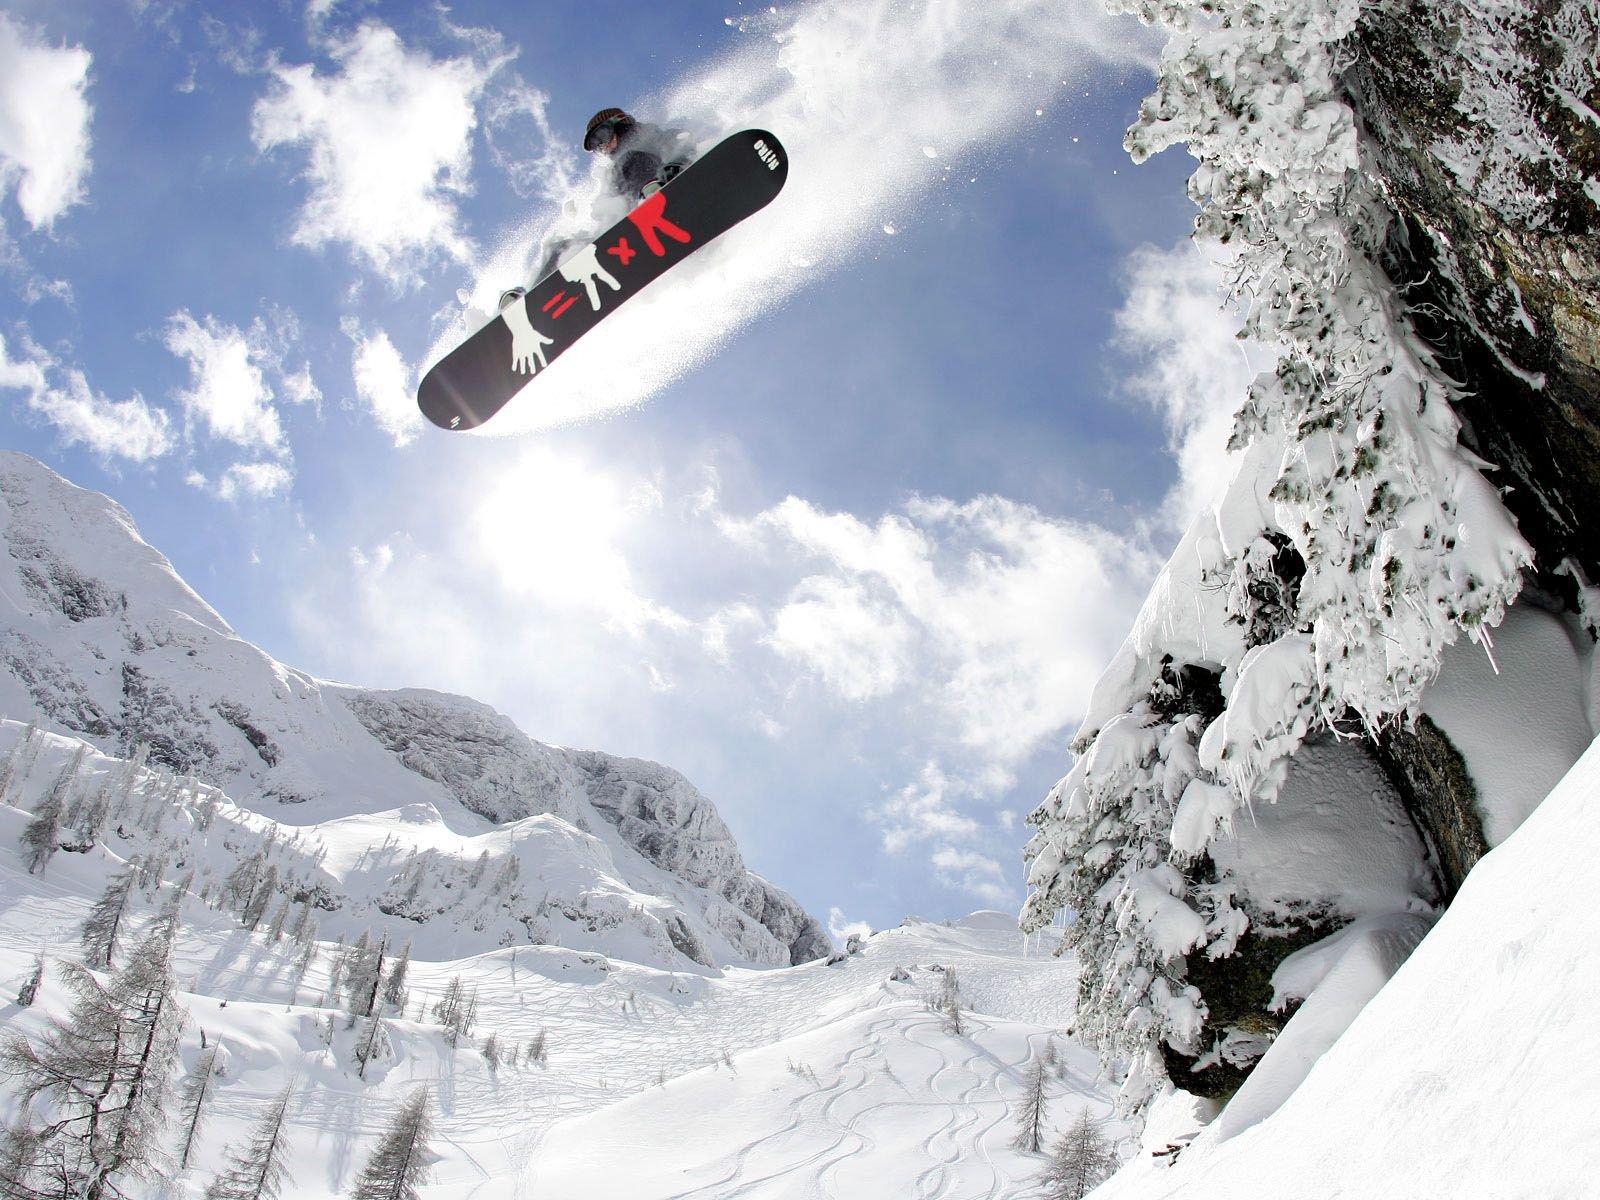 сноубордист вираж снег солнце  № 3559623 бесплатно